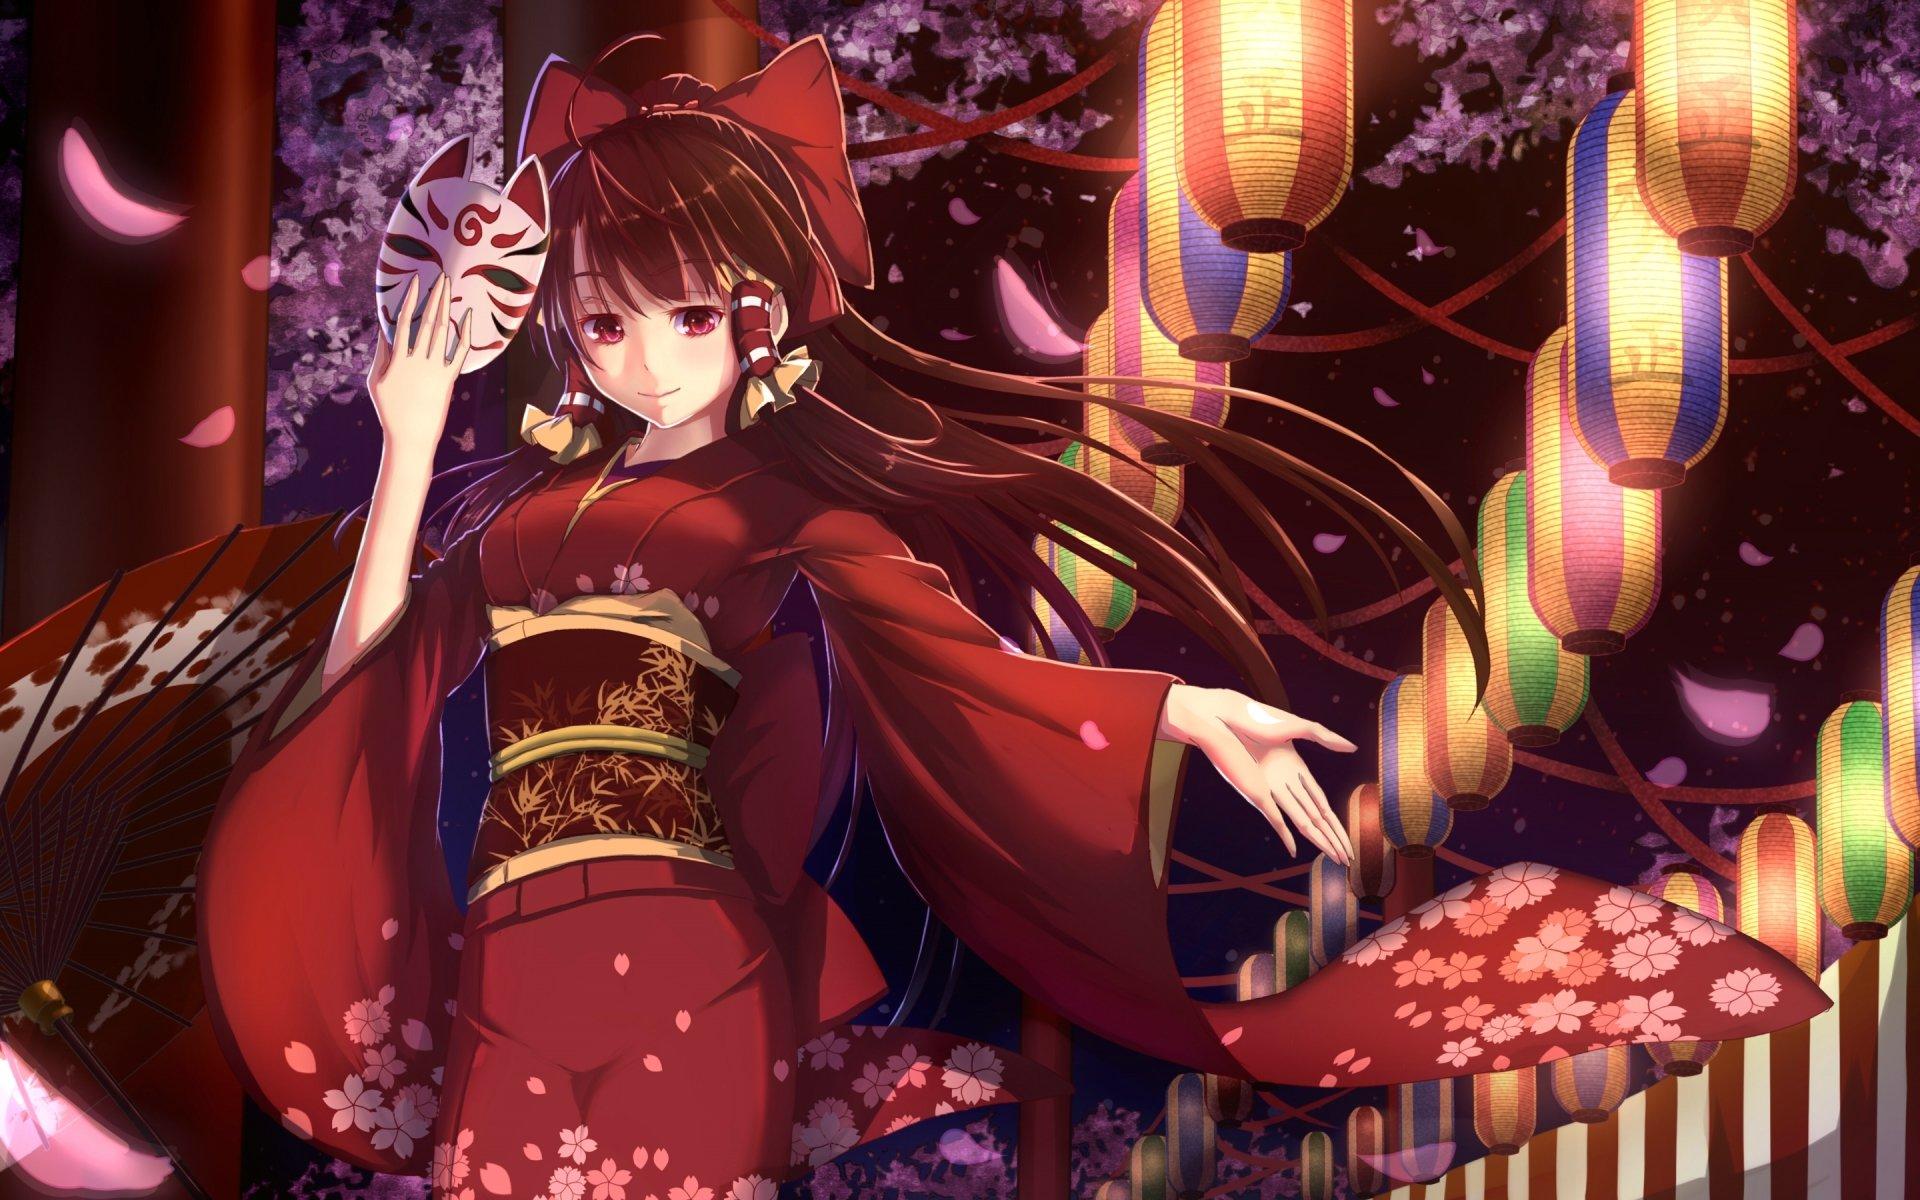 Iphone X Cherry Blossom Wallpaper Reimu Hakurei Hd Wallpaper Background Image 2880x1800